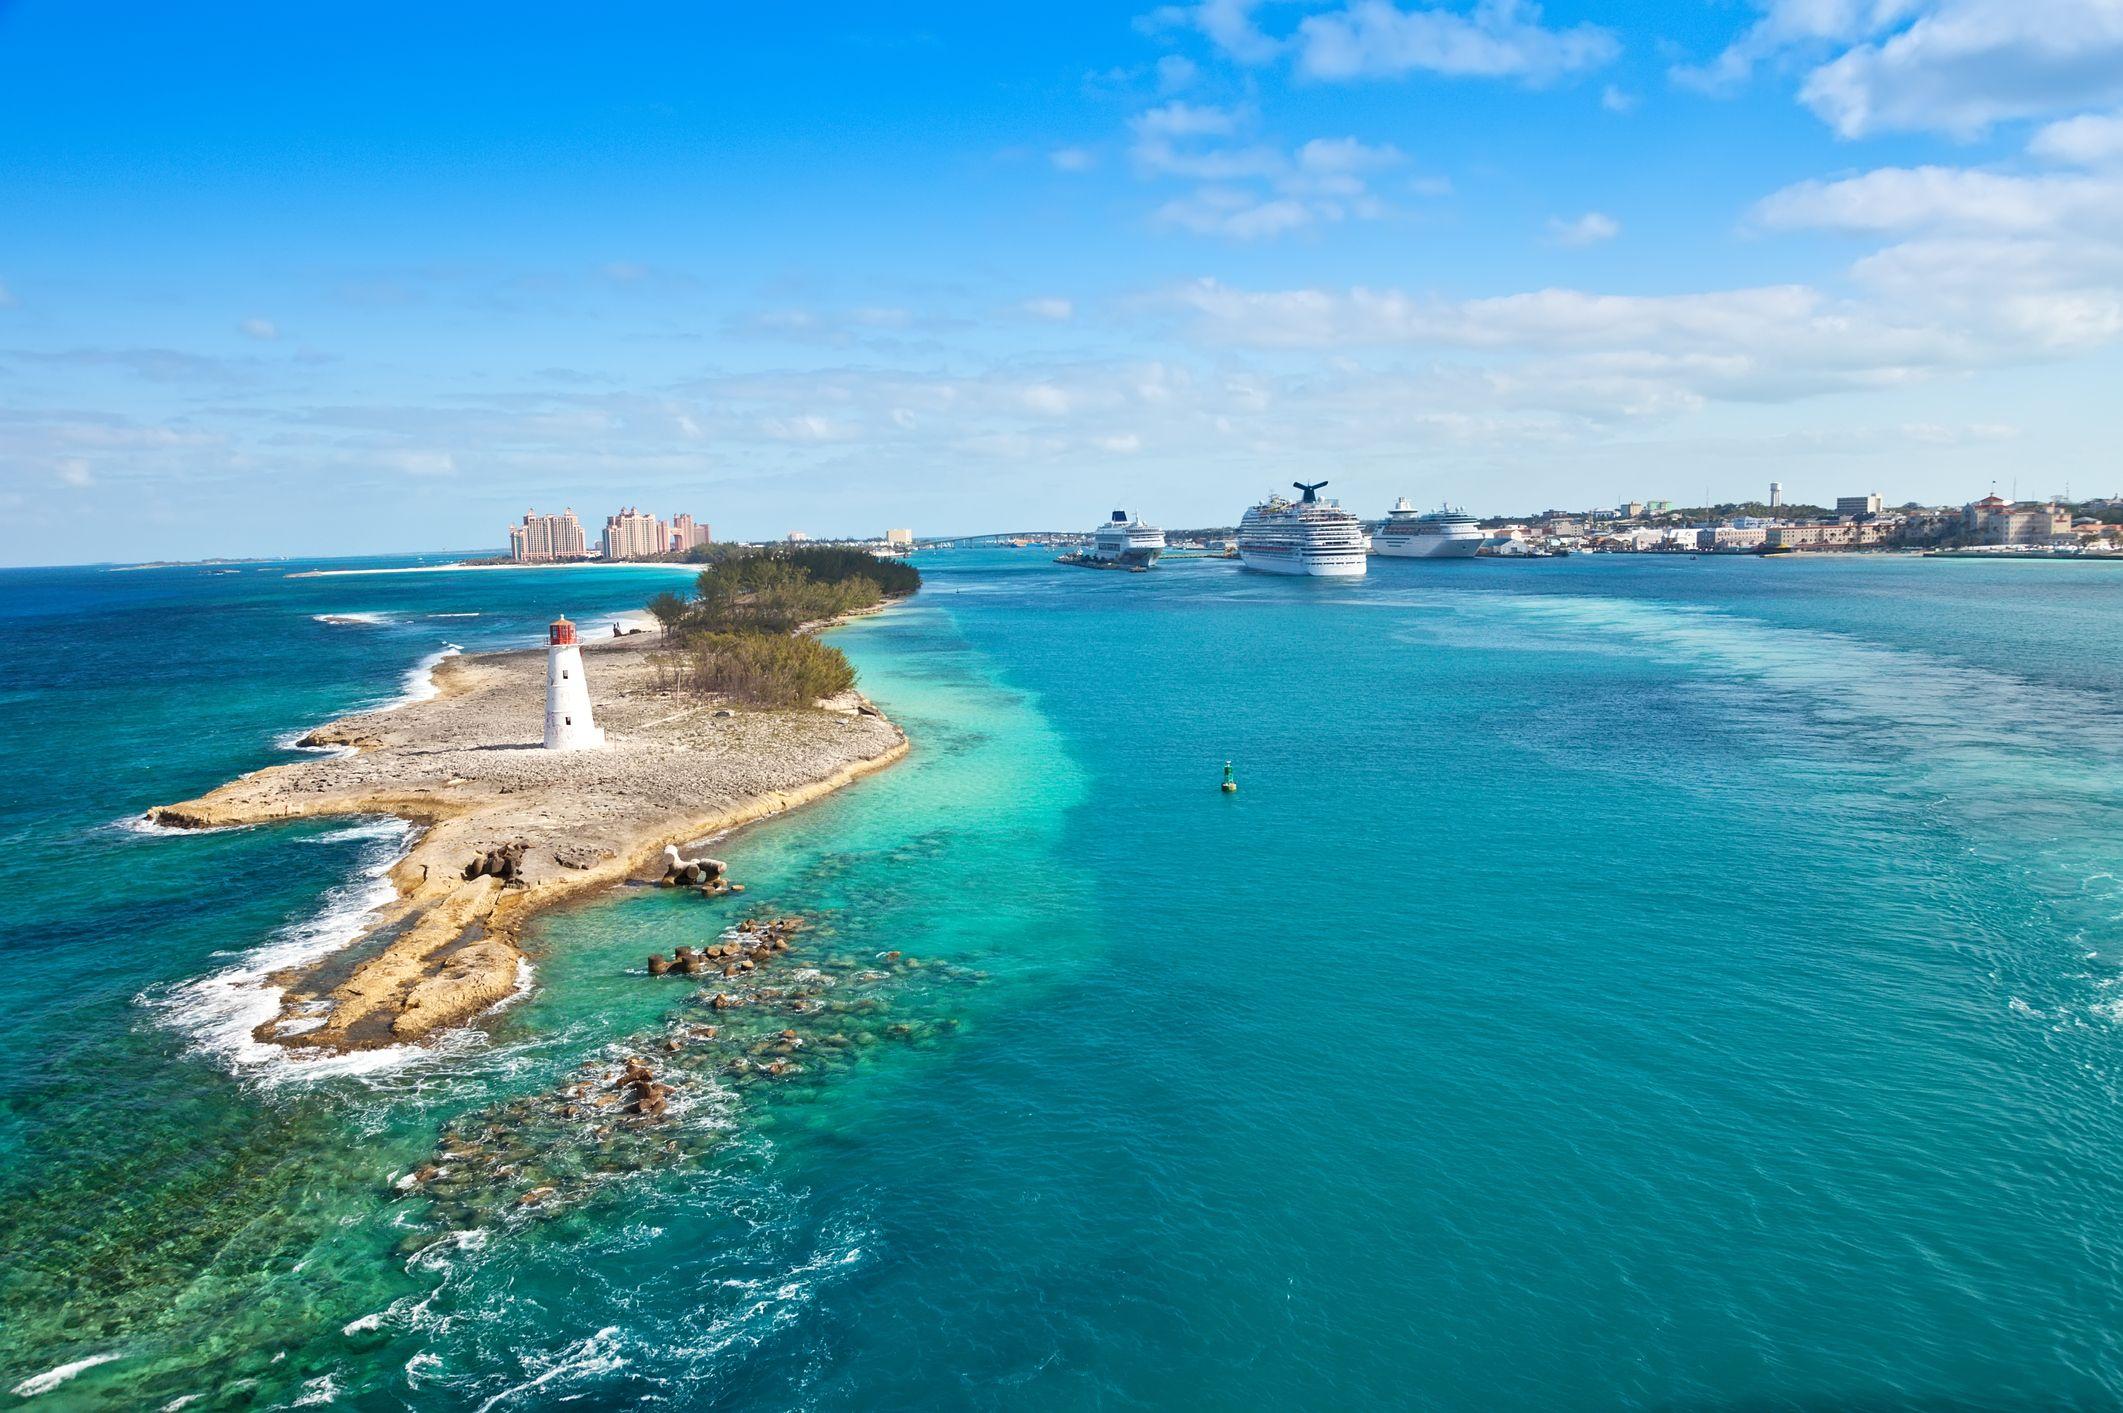 disabled couple on dream cruise ship trek stranded in